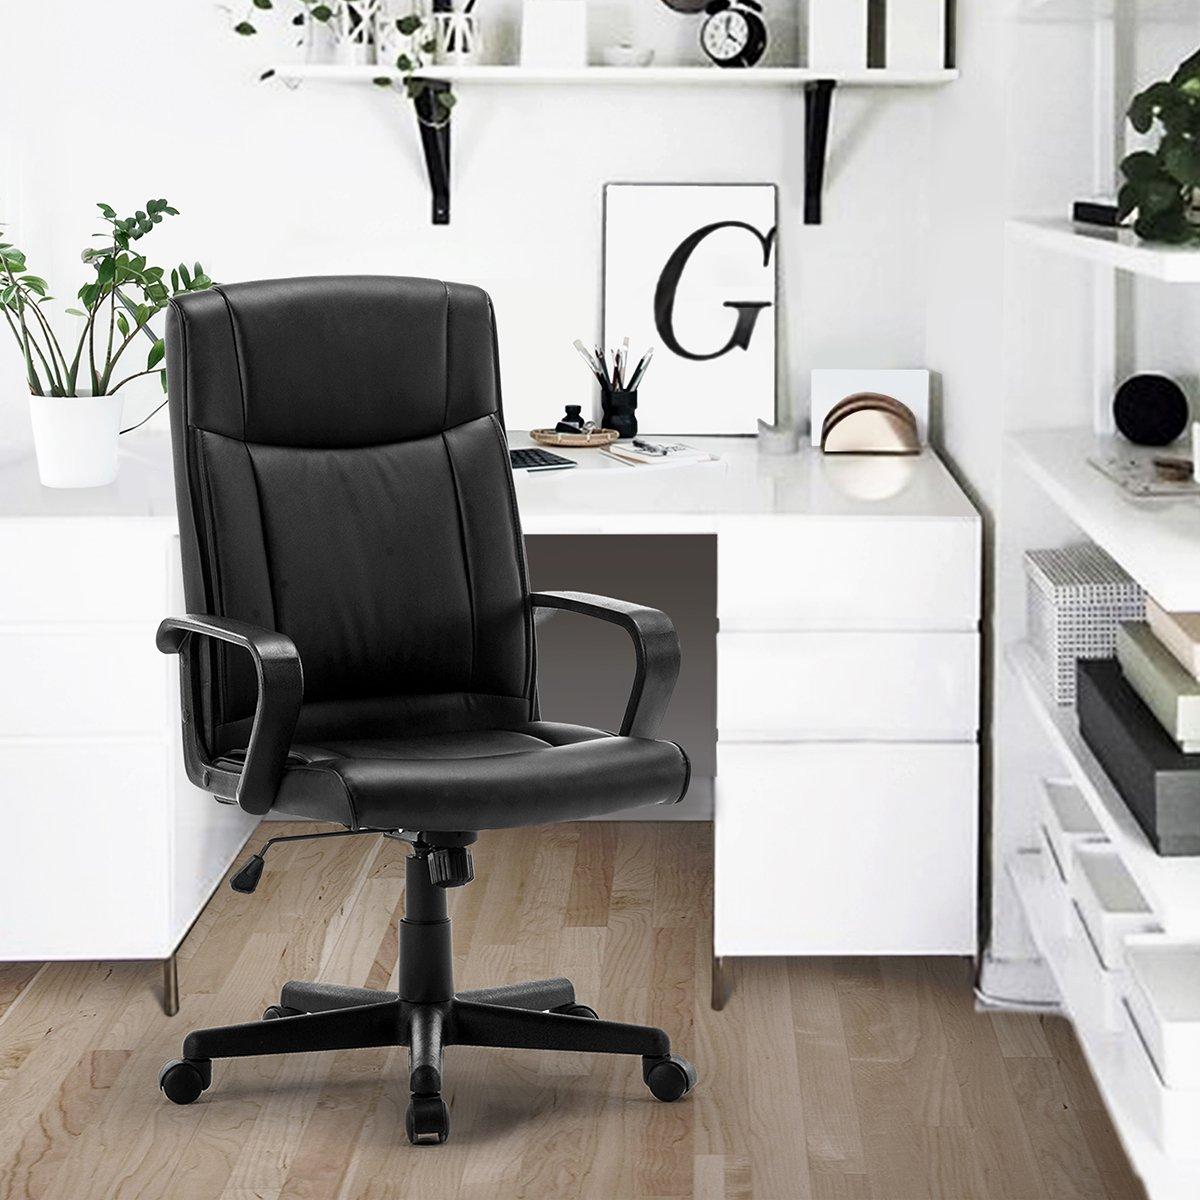 FurnitureR Silla de oficina giratoria ajustable respaldo elevado piel sintética poliuretano silla